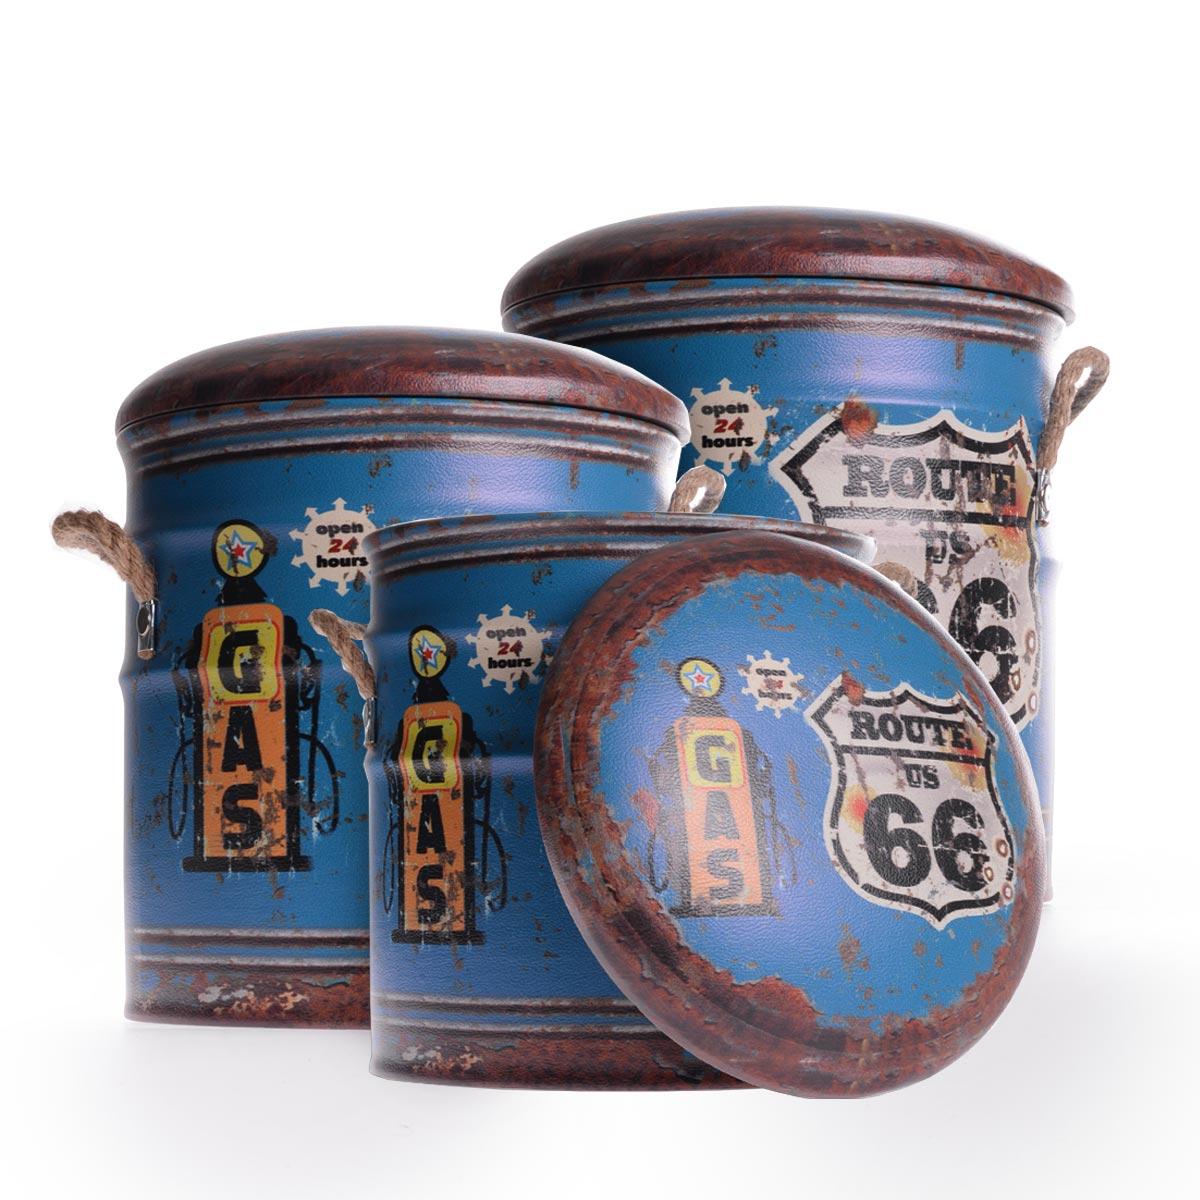 "Vintage διακοσμητικά σκαμπώ με χώρο αποθήκευσης ""Blue Route 66"" - Σετ 3 τεμαχίων - OEM 52355"